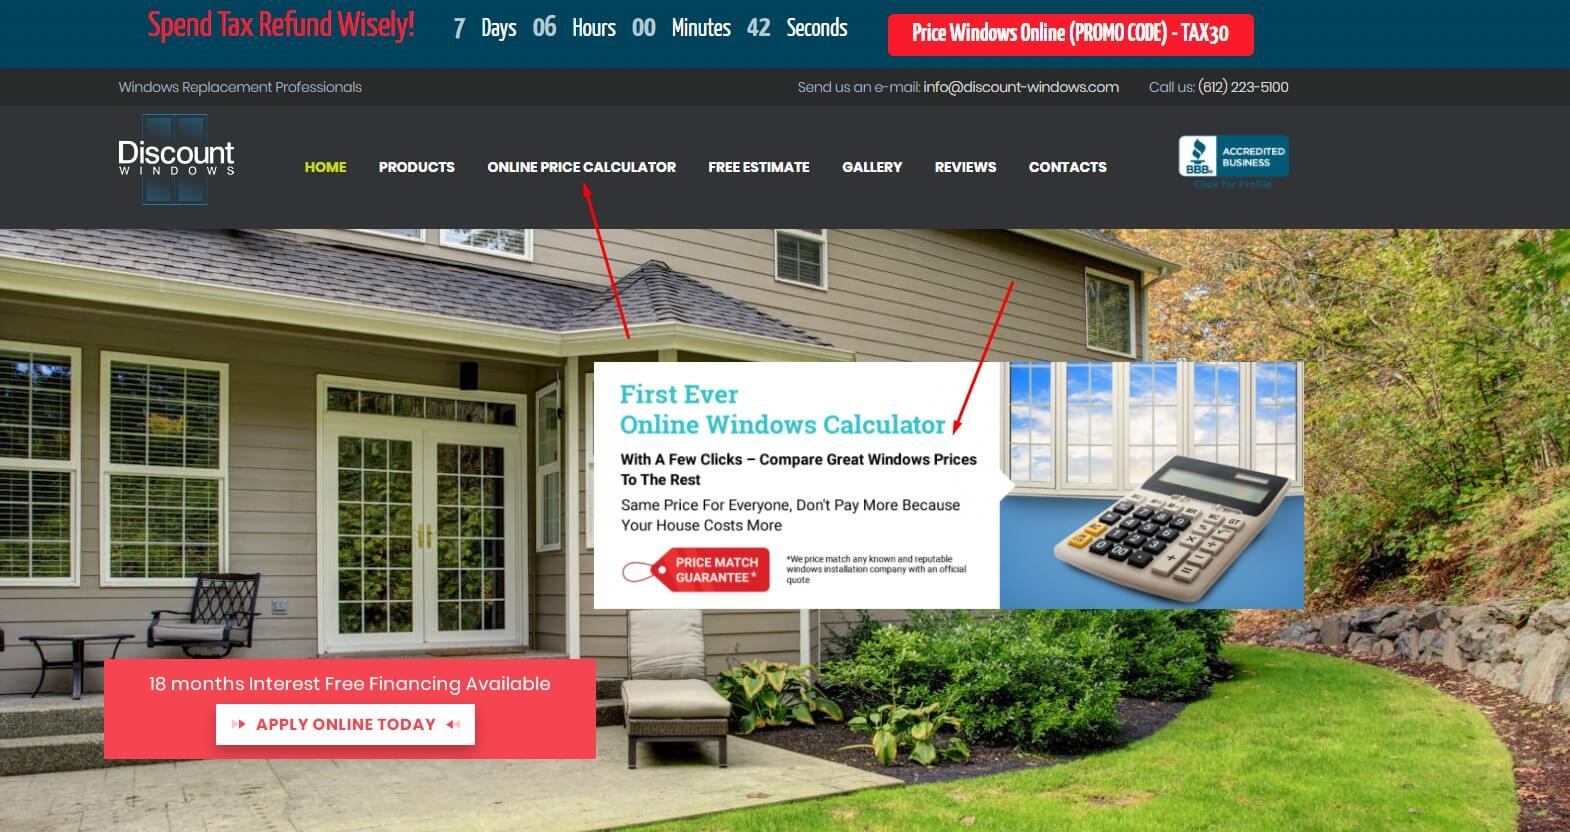 First Ever Online Calculator - Price Windows Online